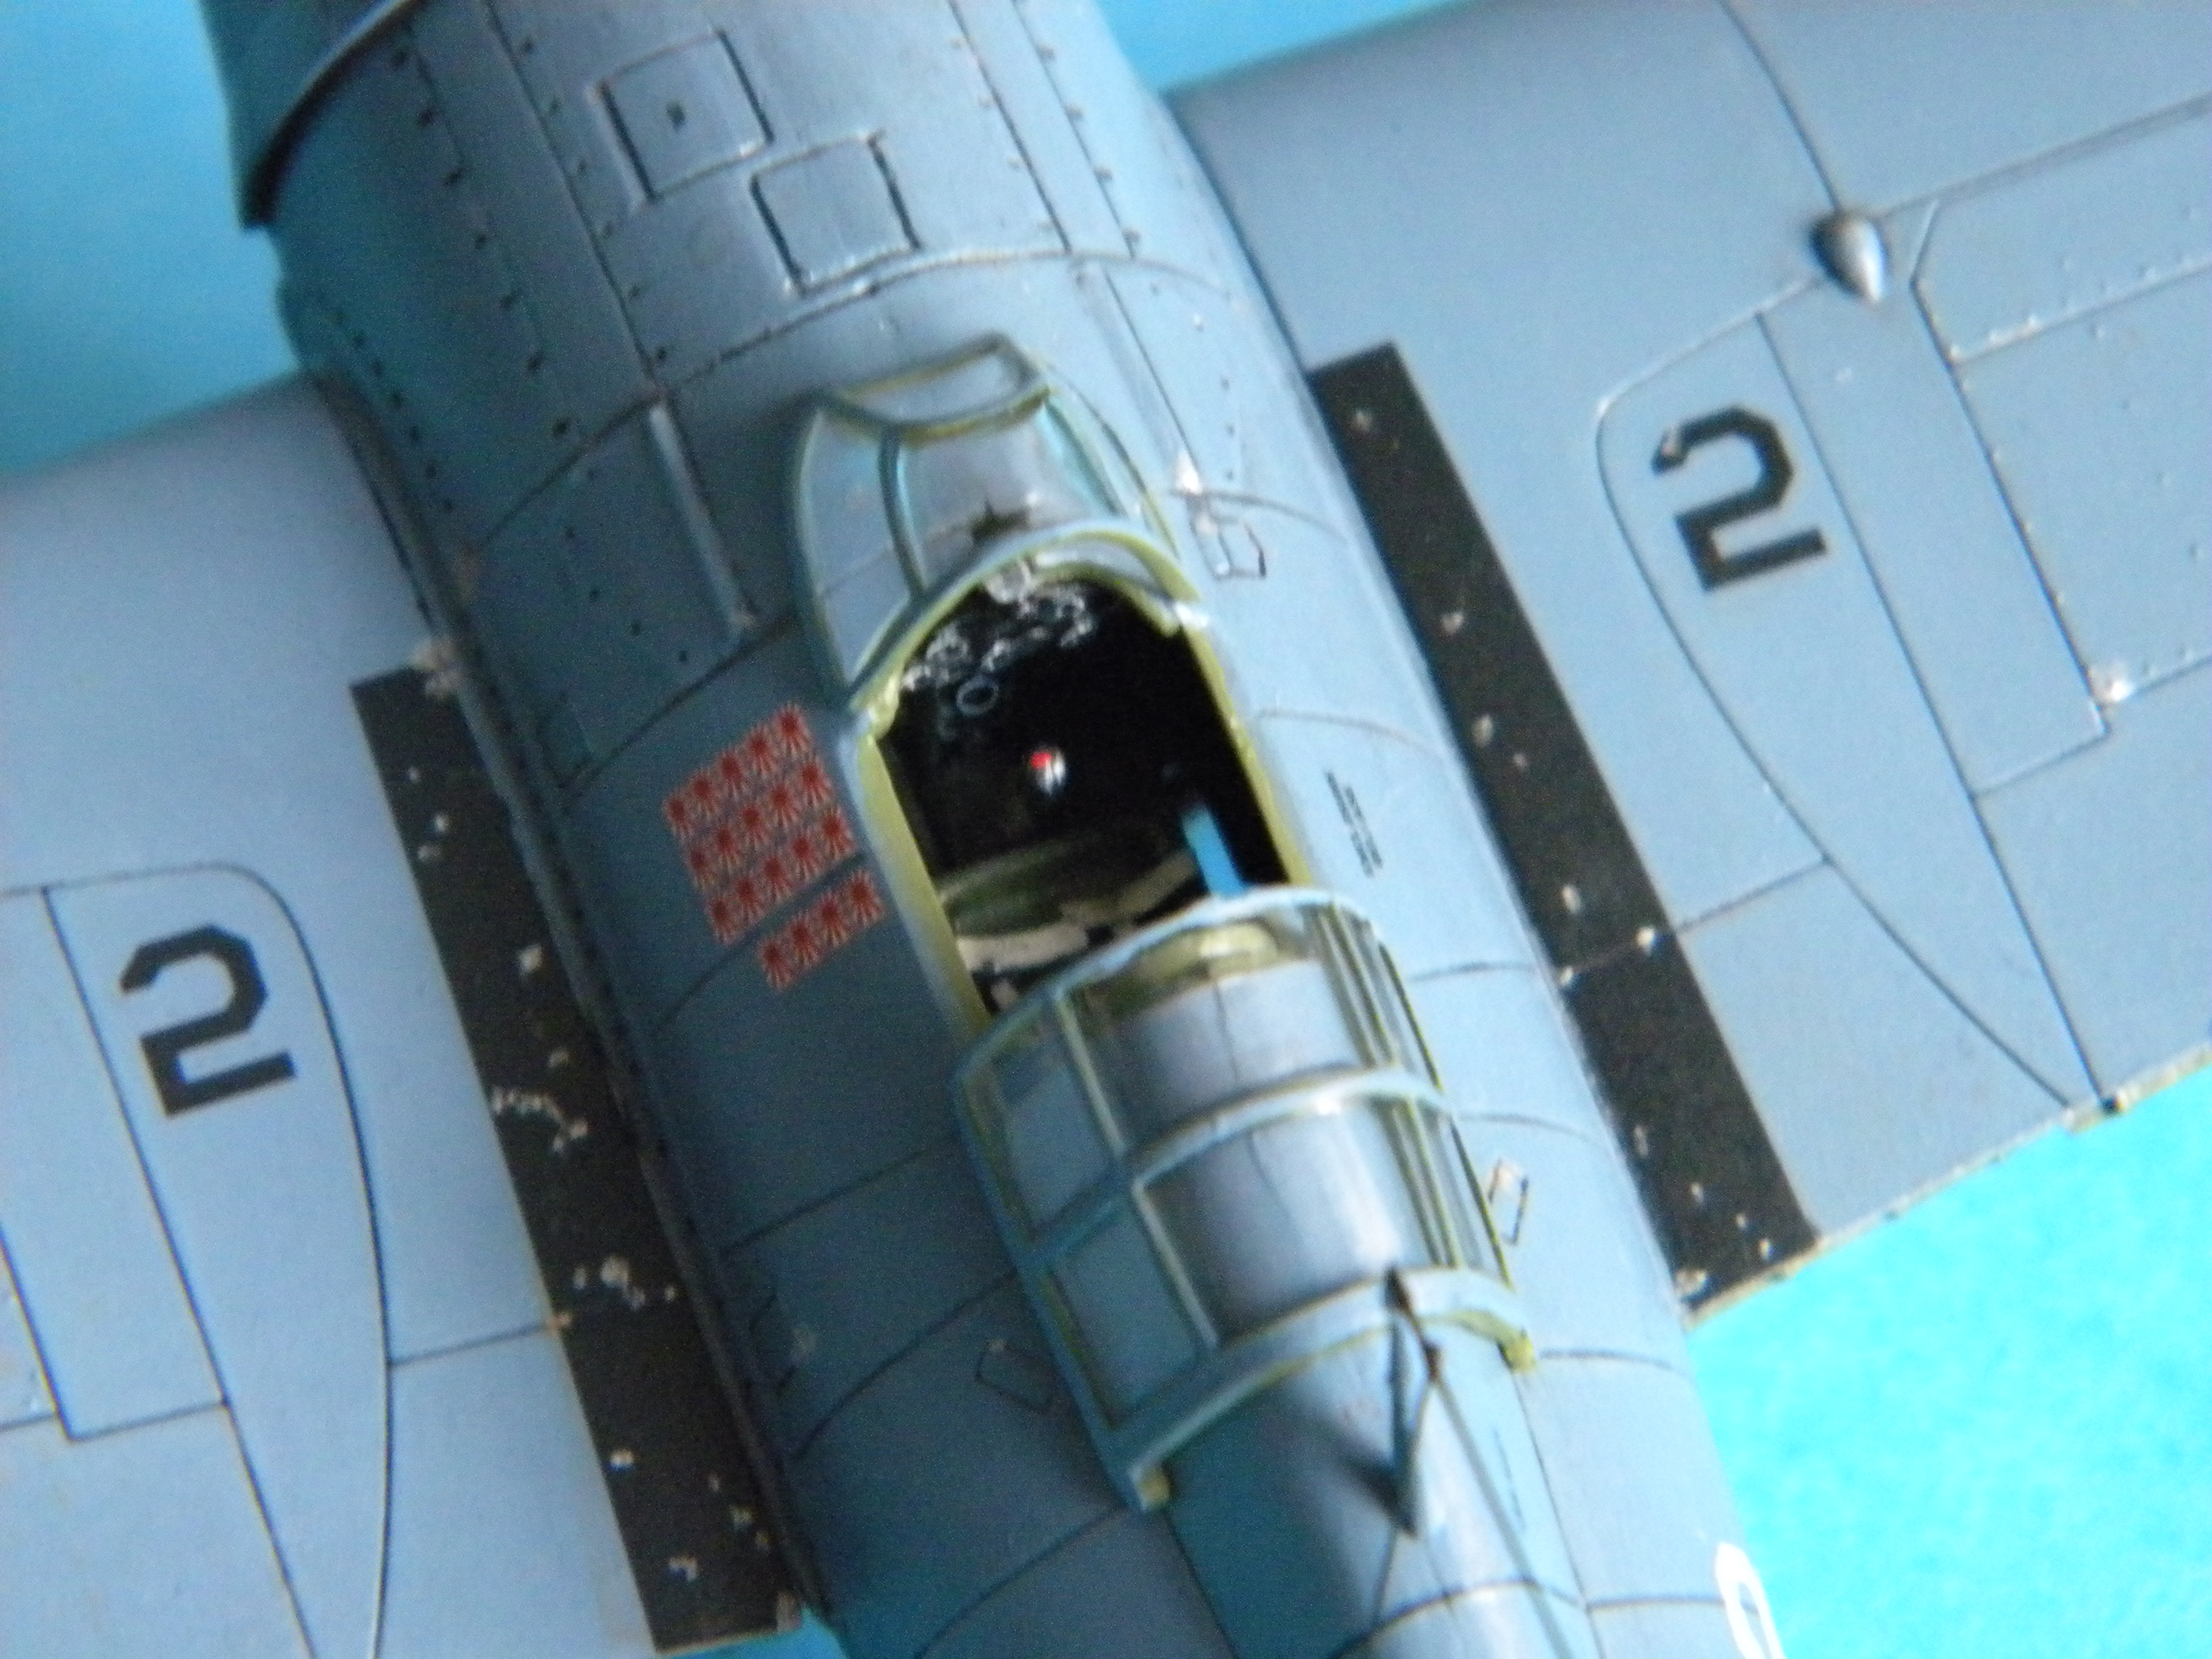 [Airfix] F4F-4 Wildcat 619914DSCN9533